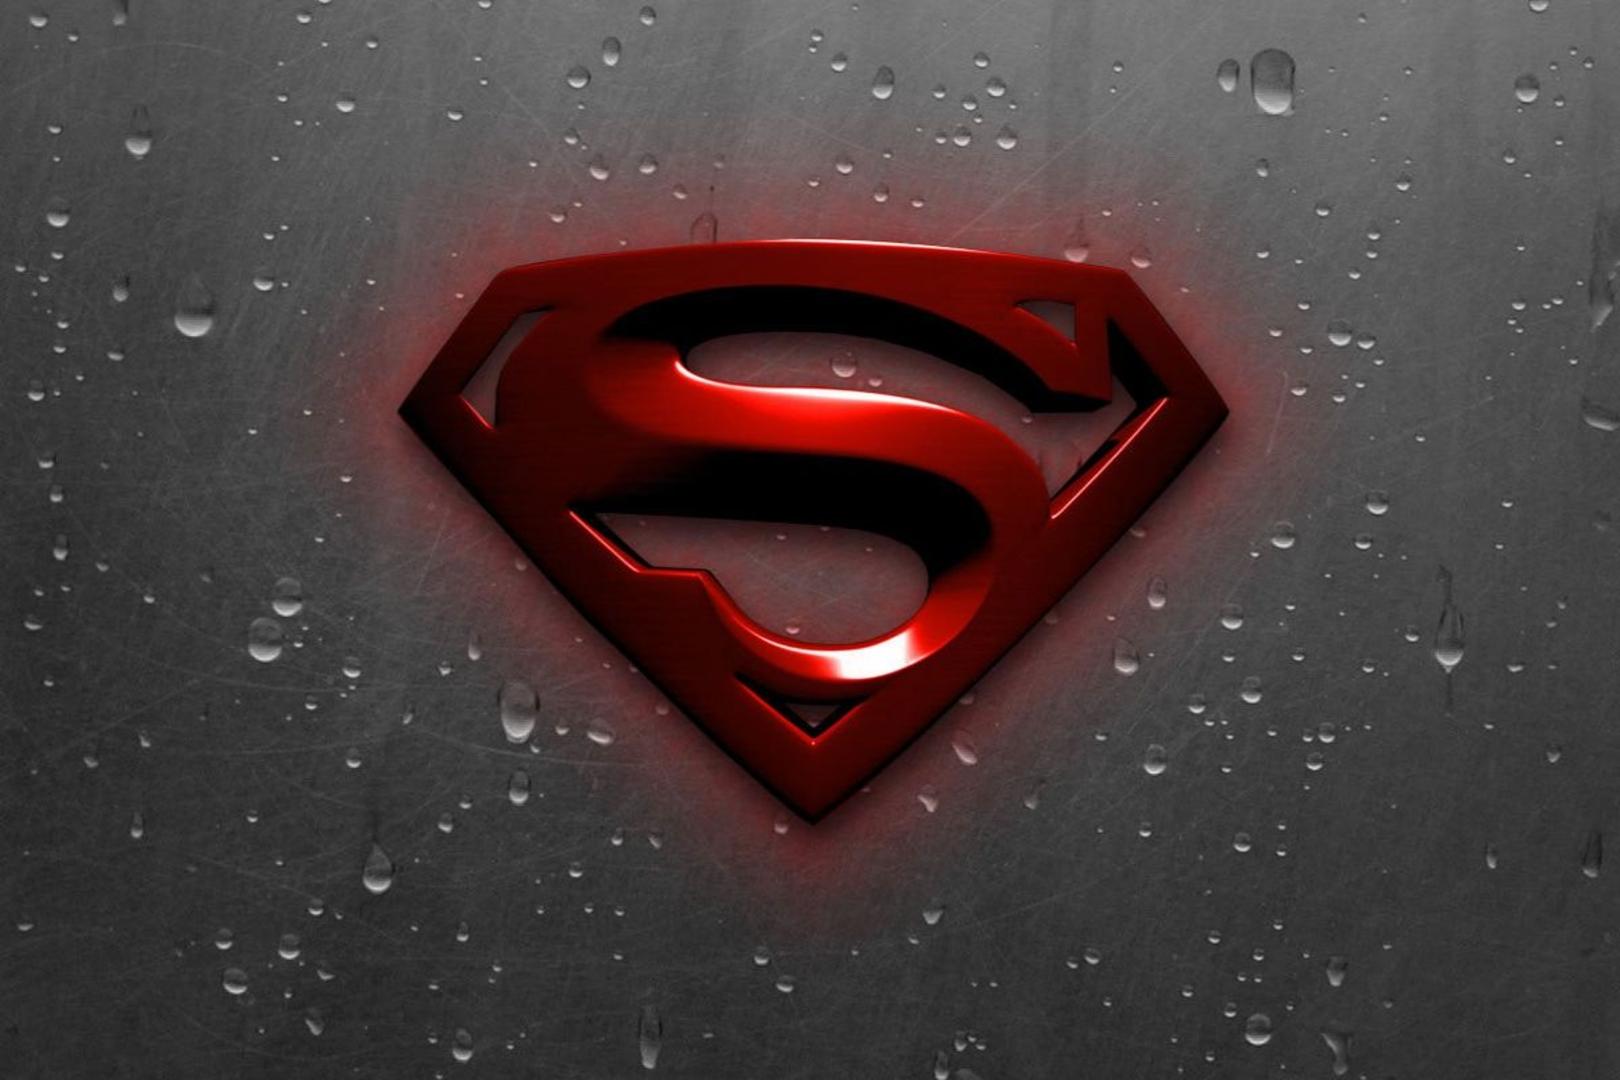 Superman Logo Wallpaper hd 19201080 HD wallpaper background 1620x1080